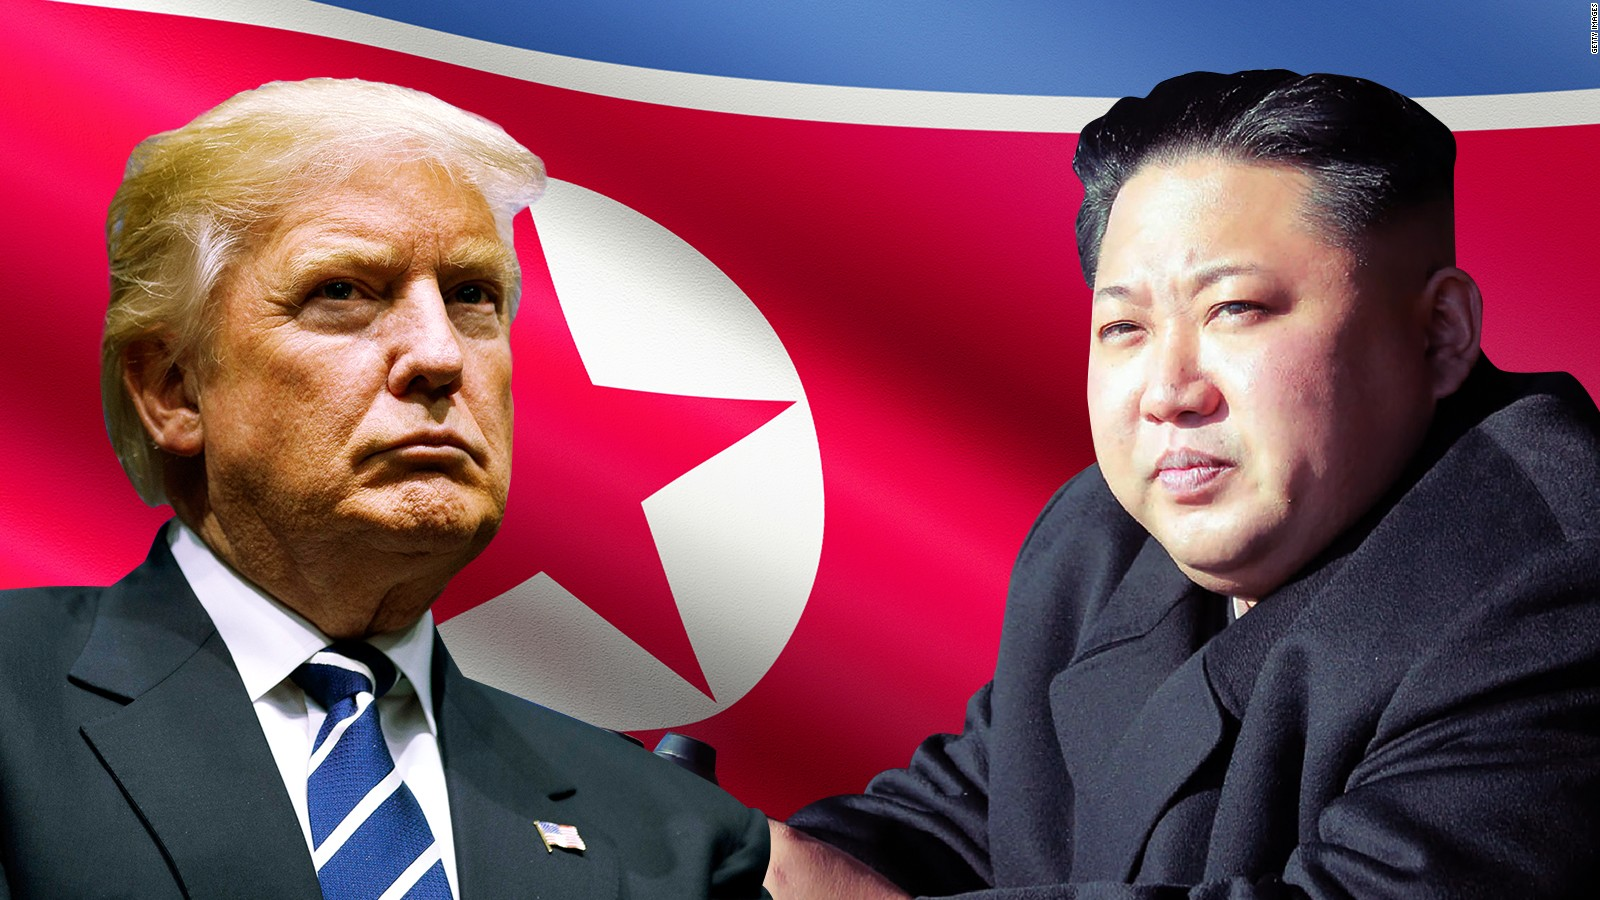 170809143550-mobapp-trump-jungun-north-korea-flag-02-full-169.jpg